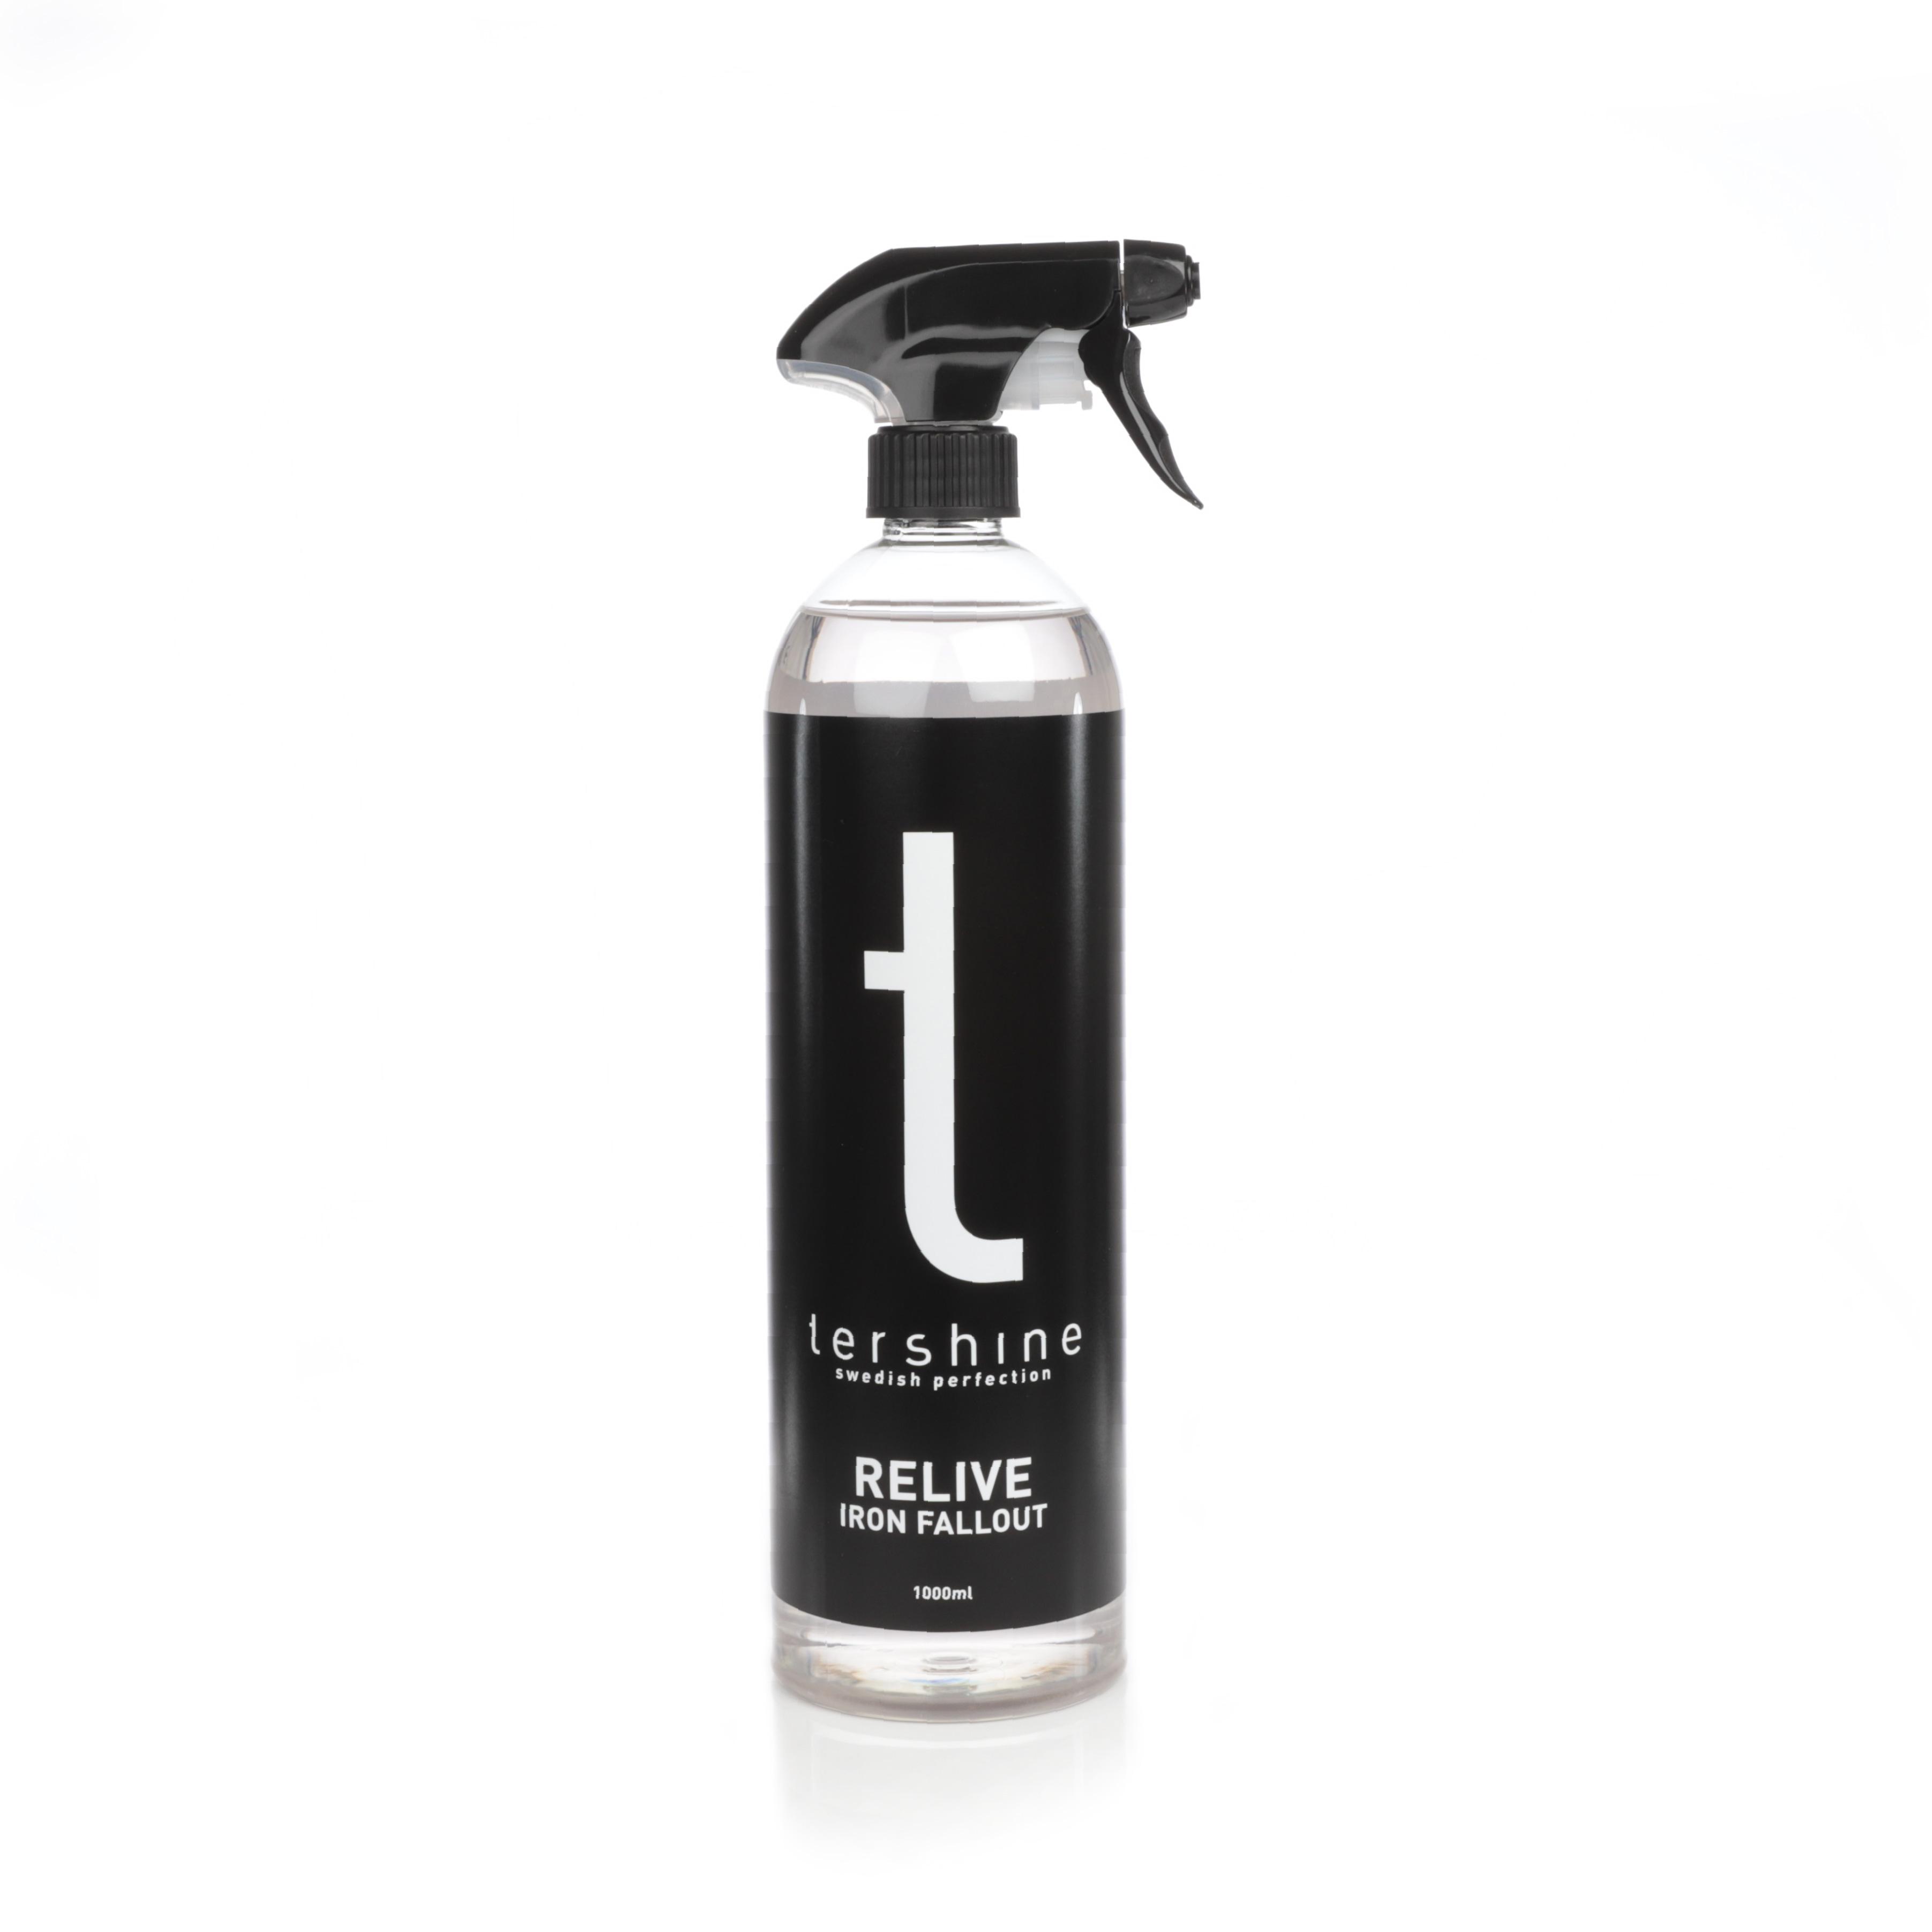 Flygrostlösare tershine Relive, Endast flaska, 1000 ml